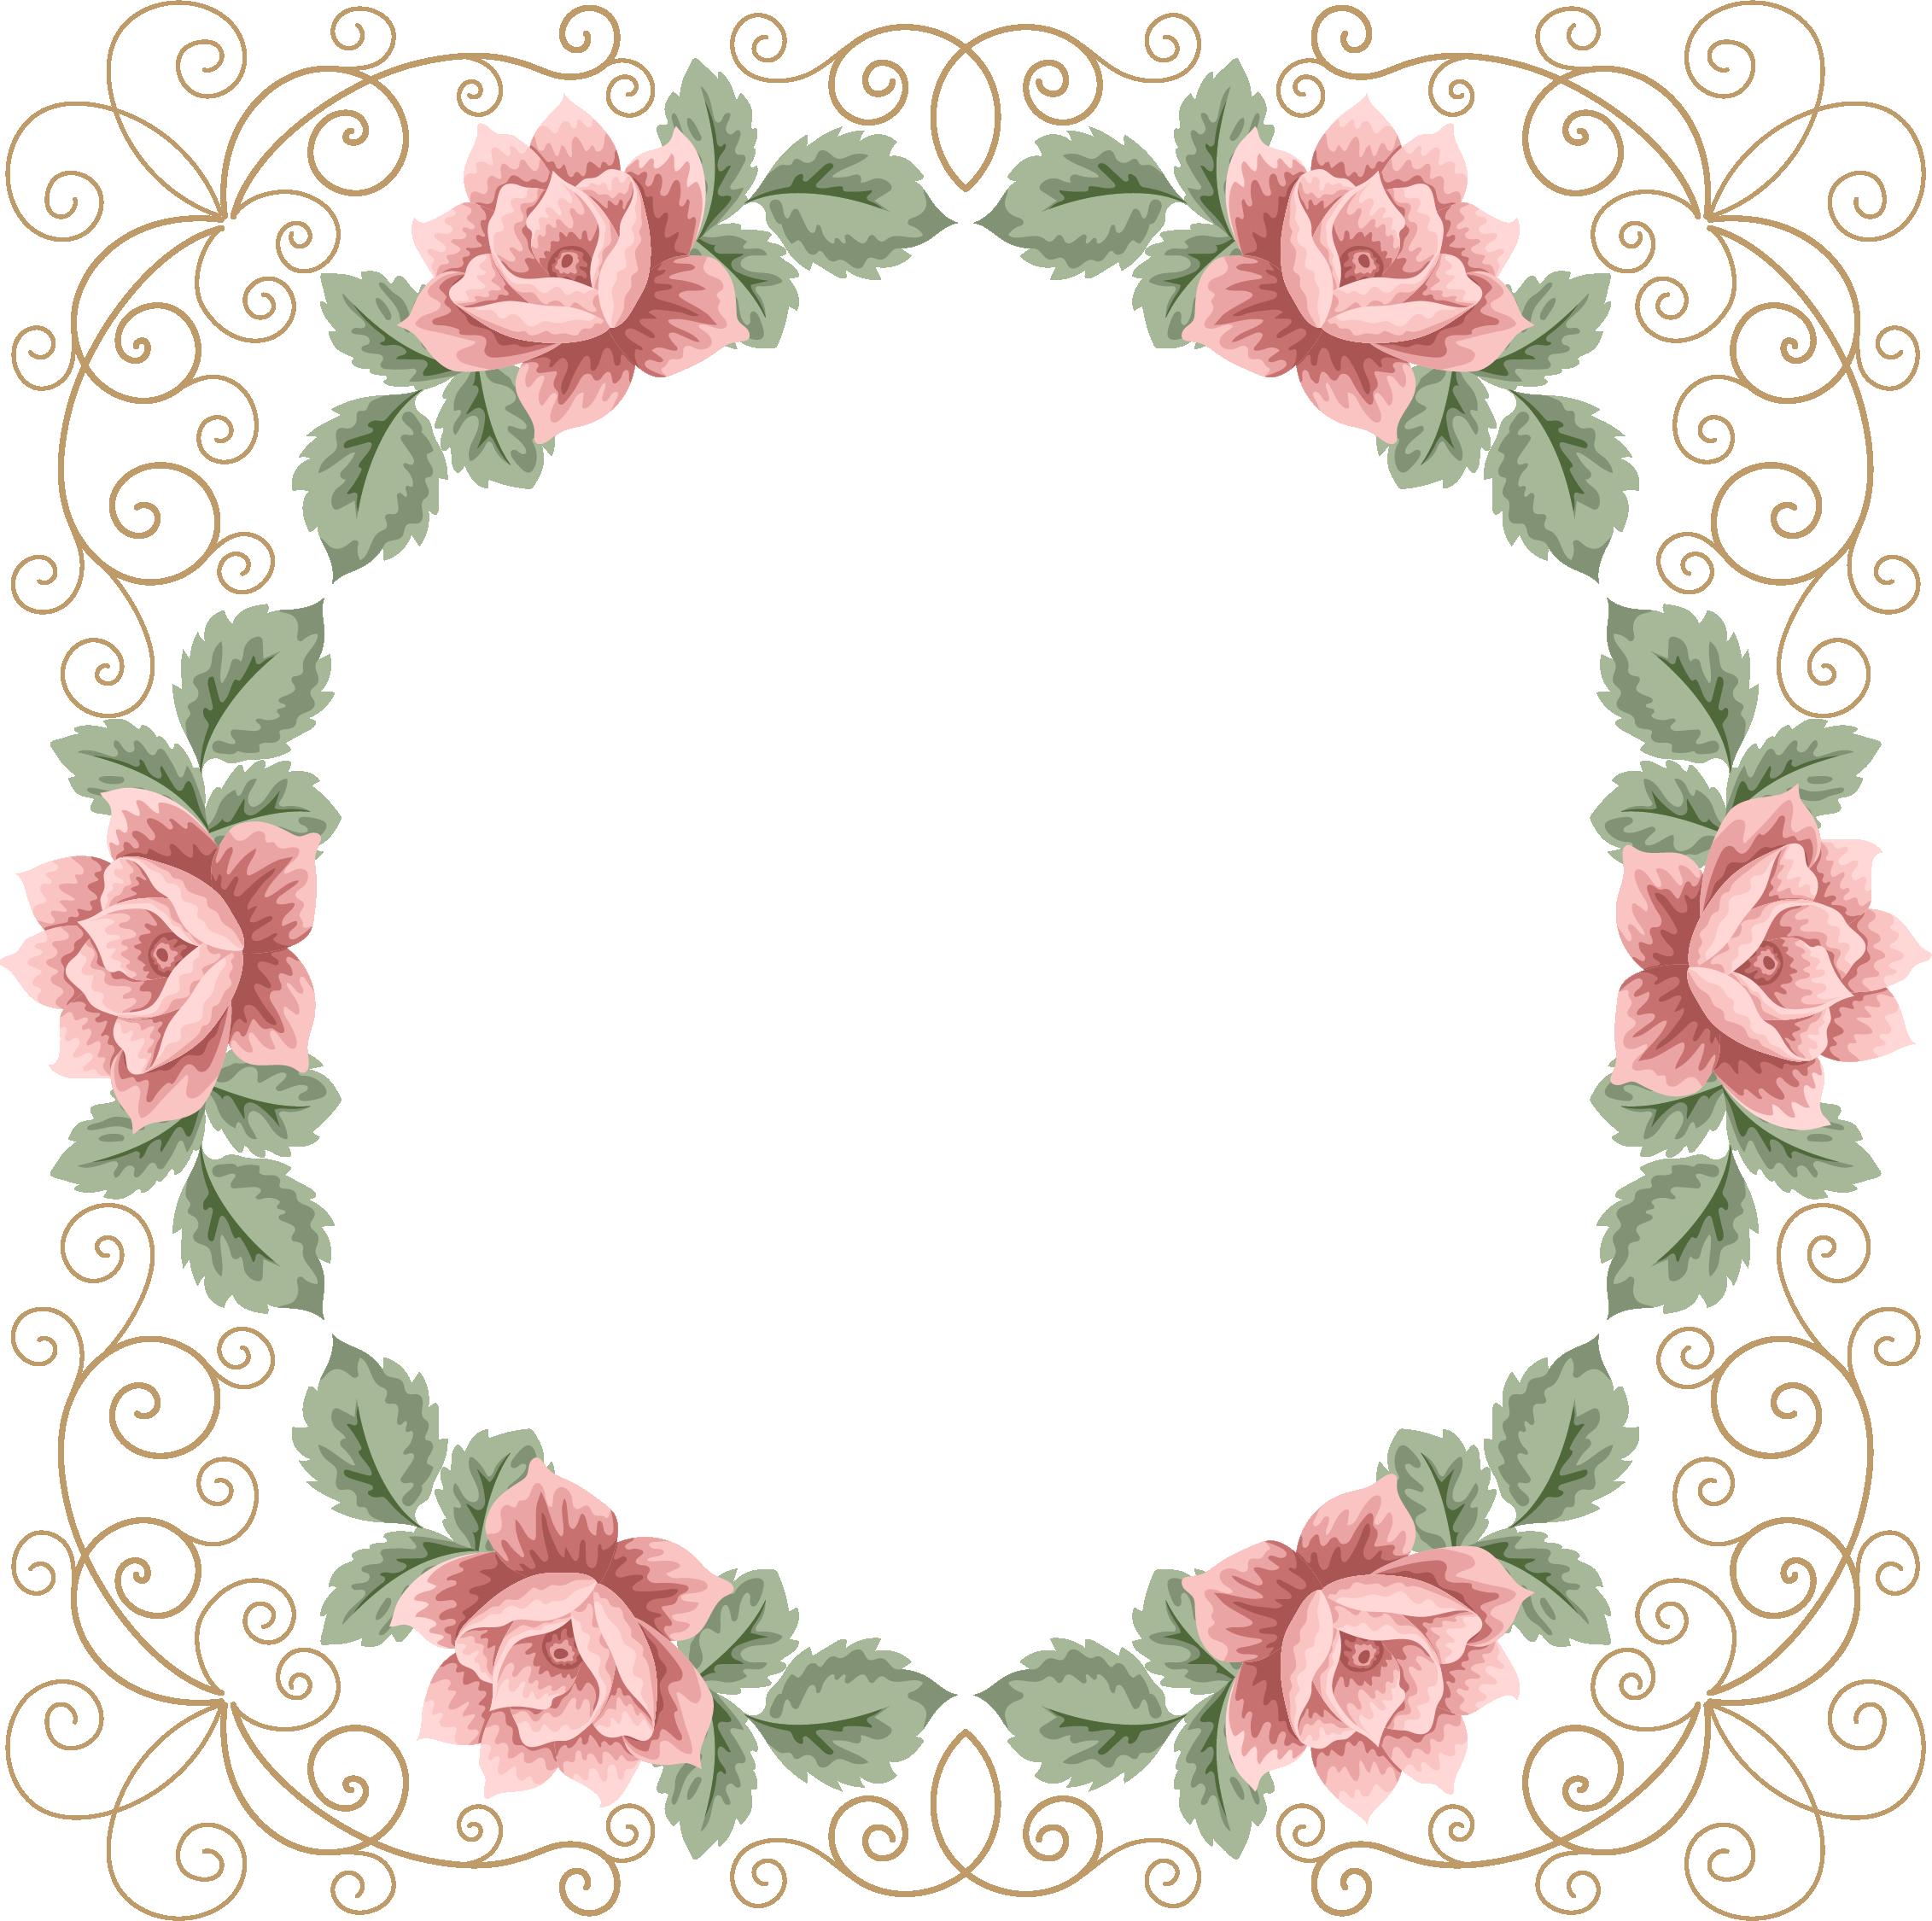 Planner clipart vector. Freedesignfile com floral frame